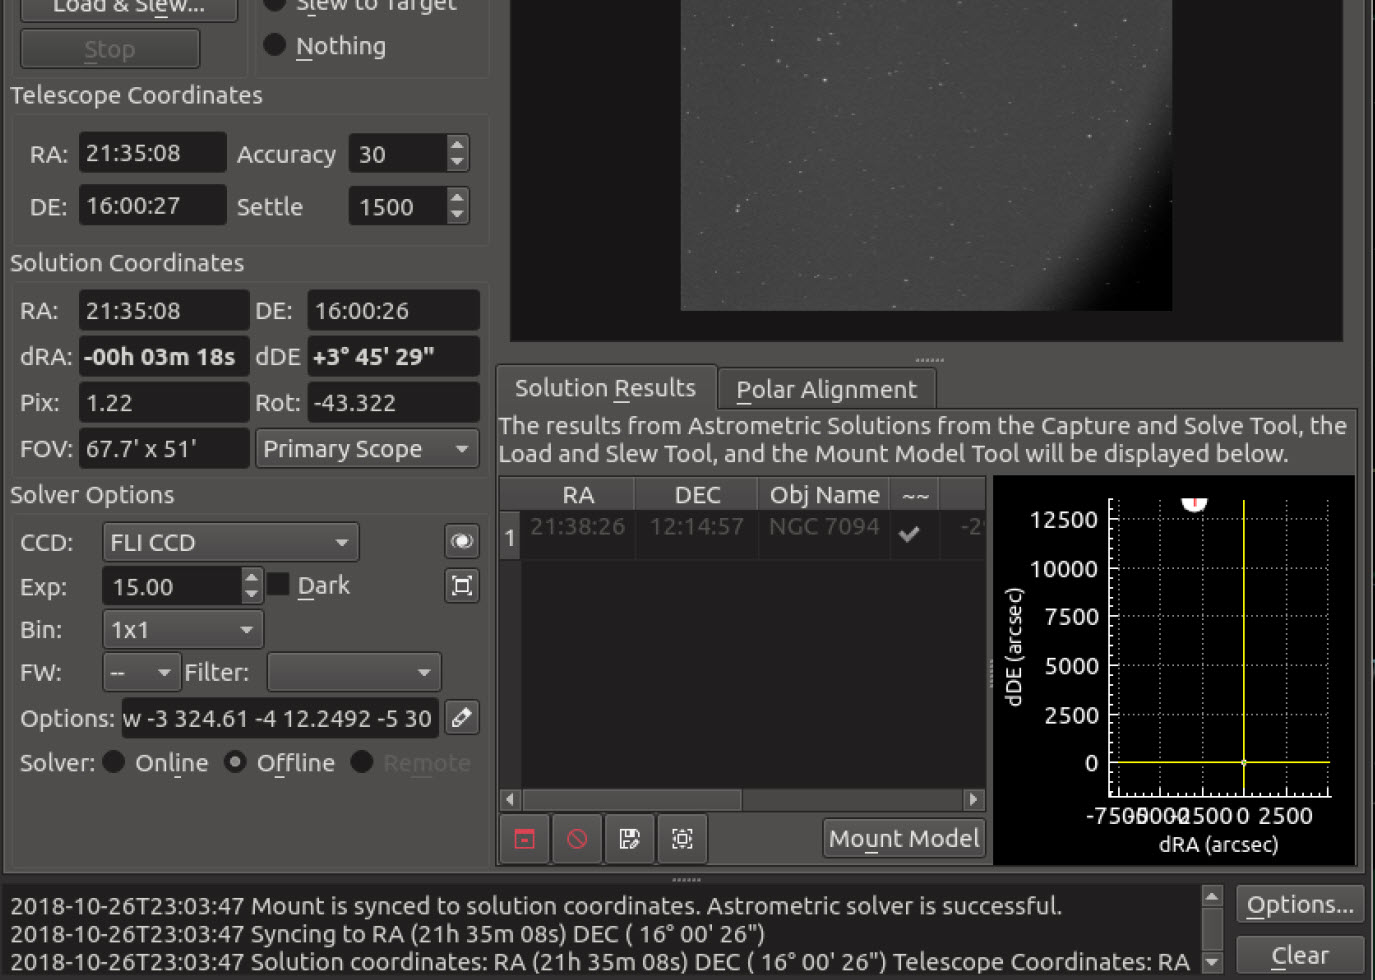 StellarMate — TheAstroGazer